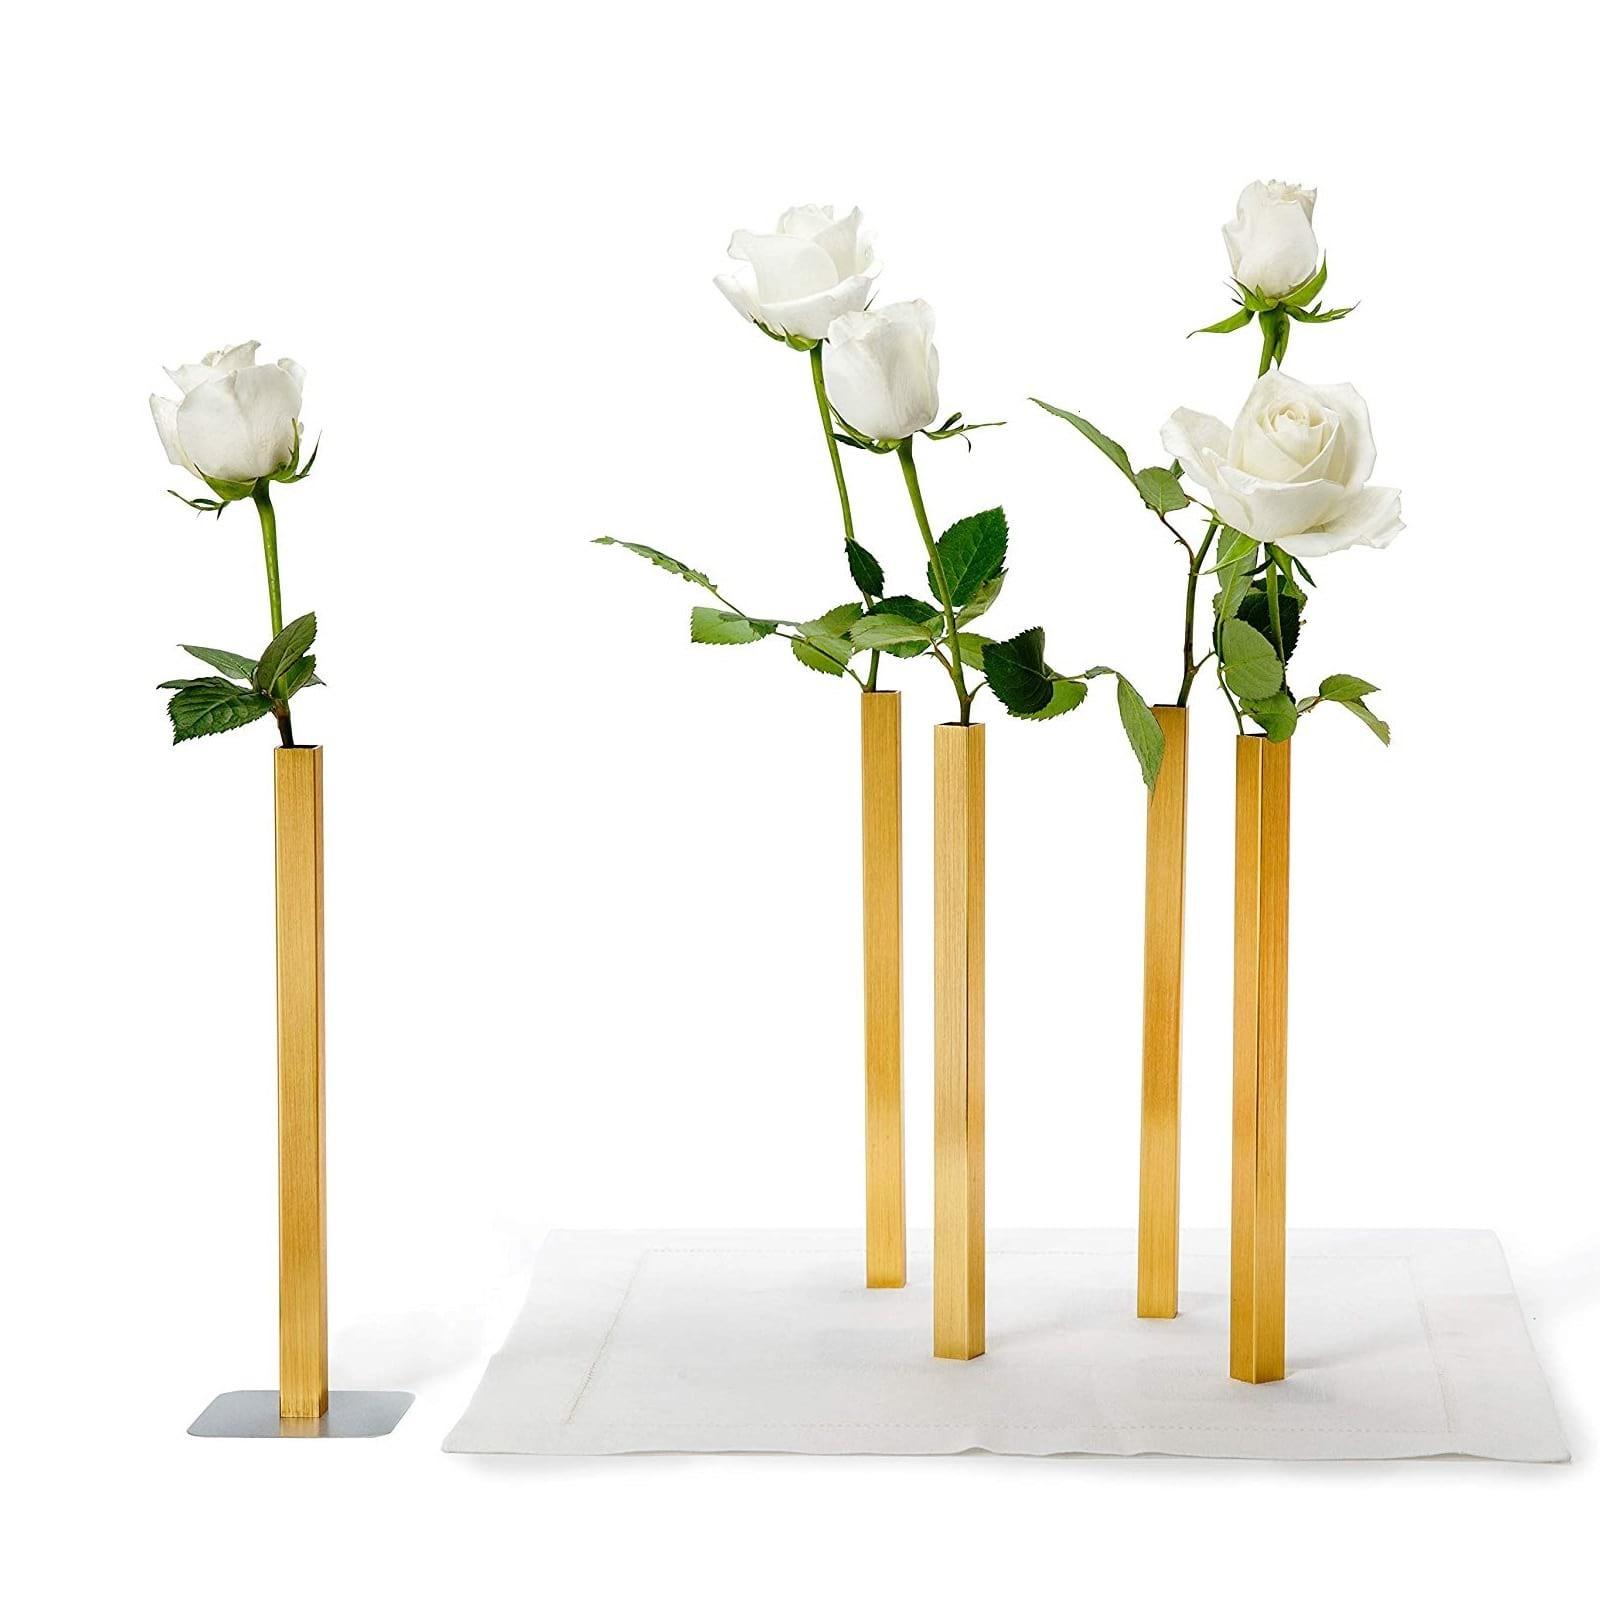 Magnetic Vase Set of 5 Aluminium Flower Vases (Copper) - Peleg Design